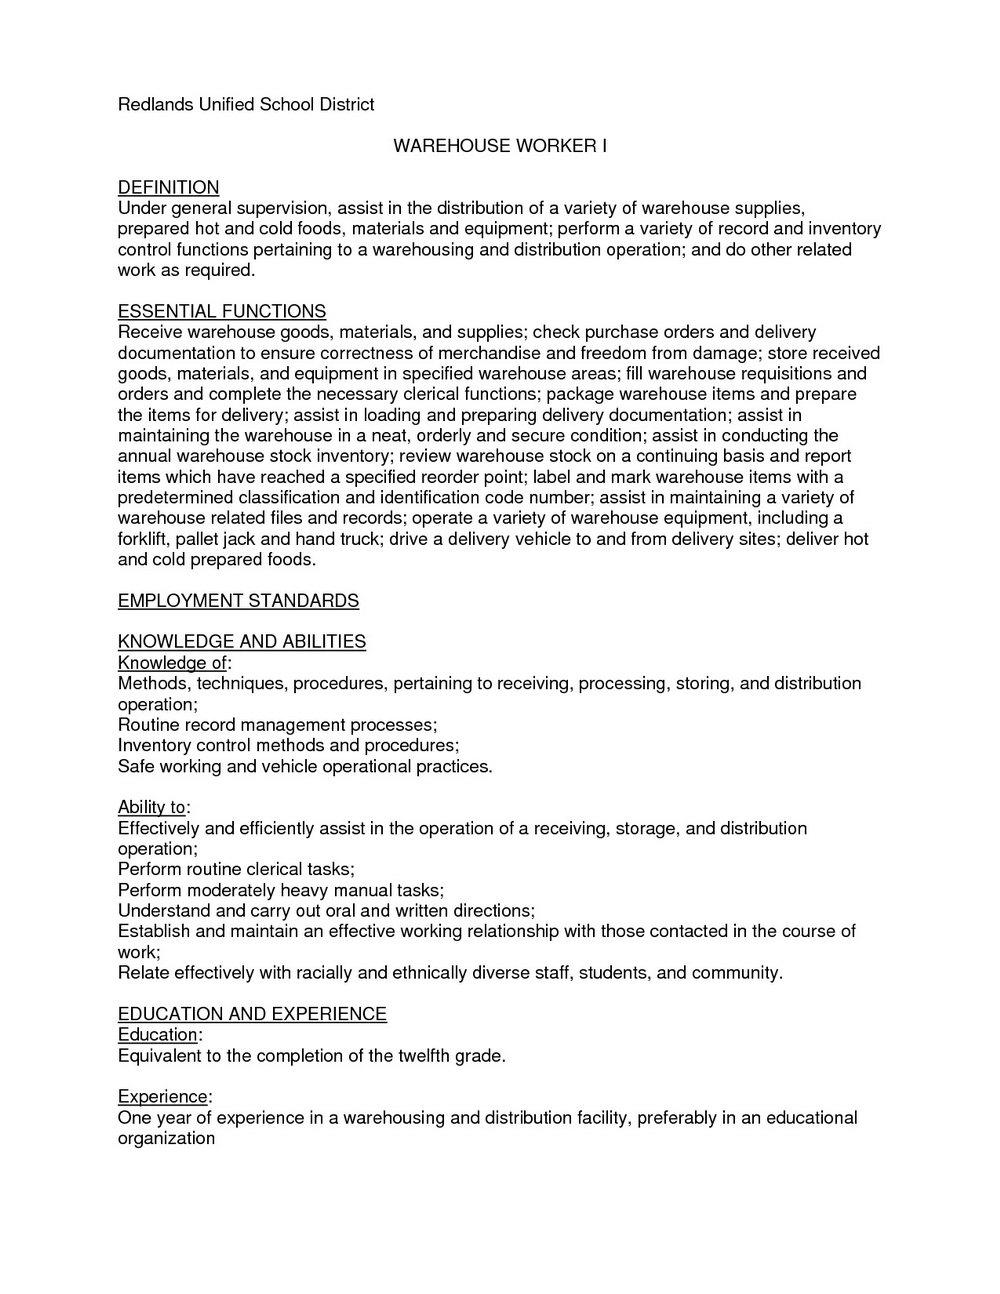 Free Sample Resume Warehouse Worker